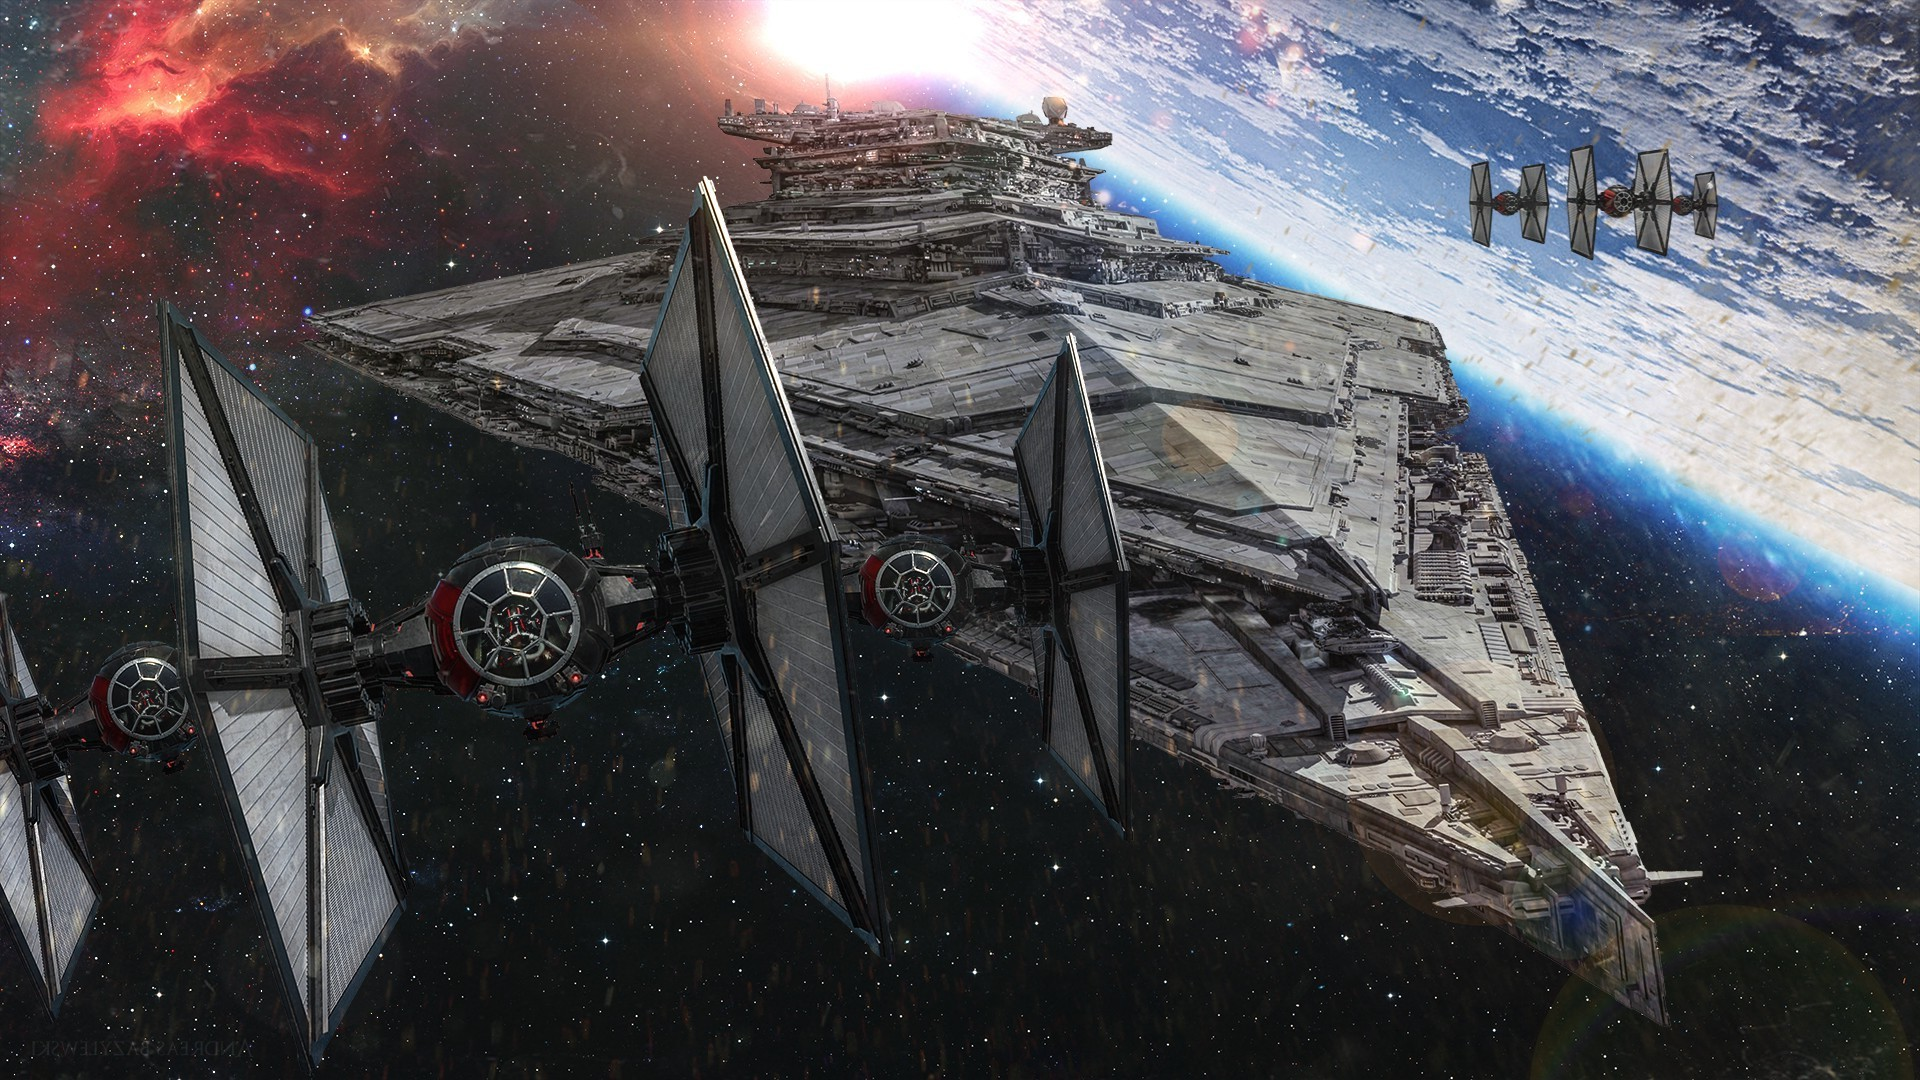 Star Wars Art Wallpaper 77 Images